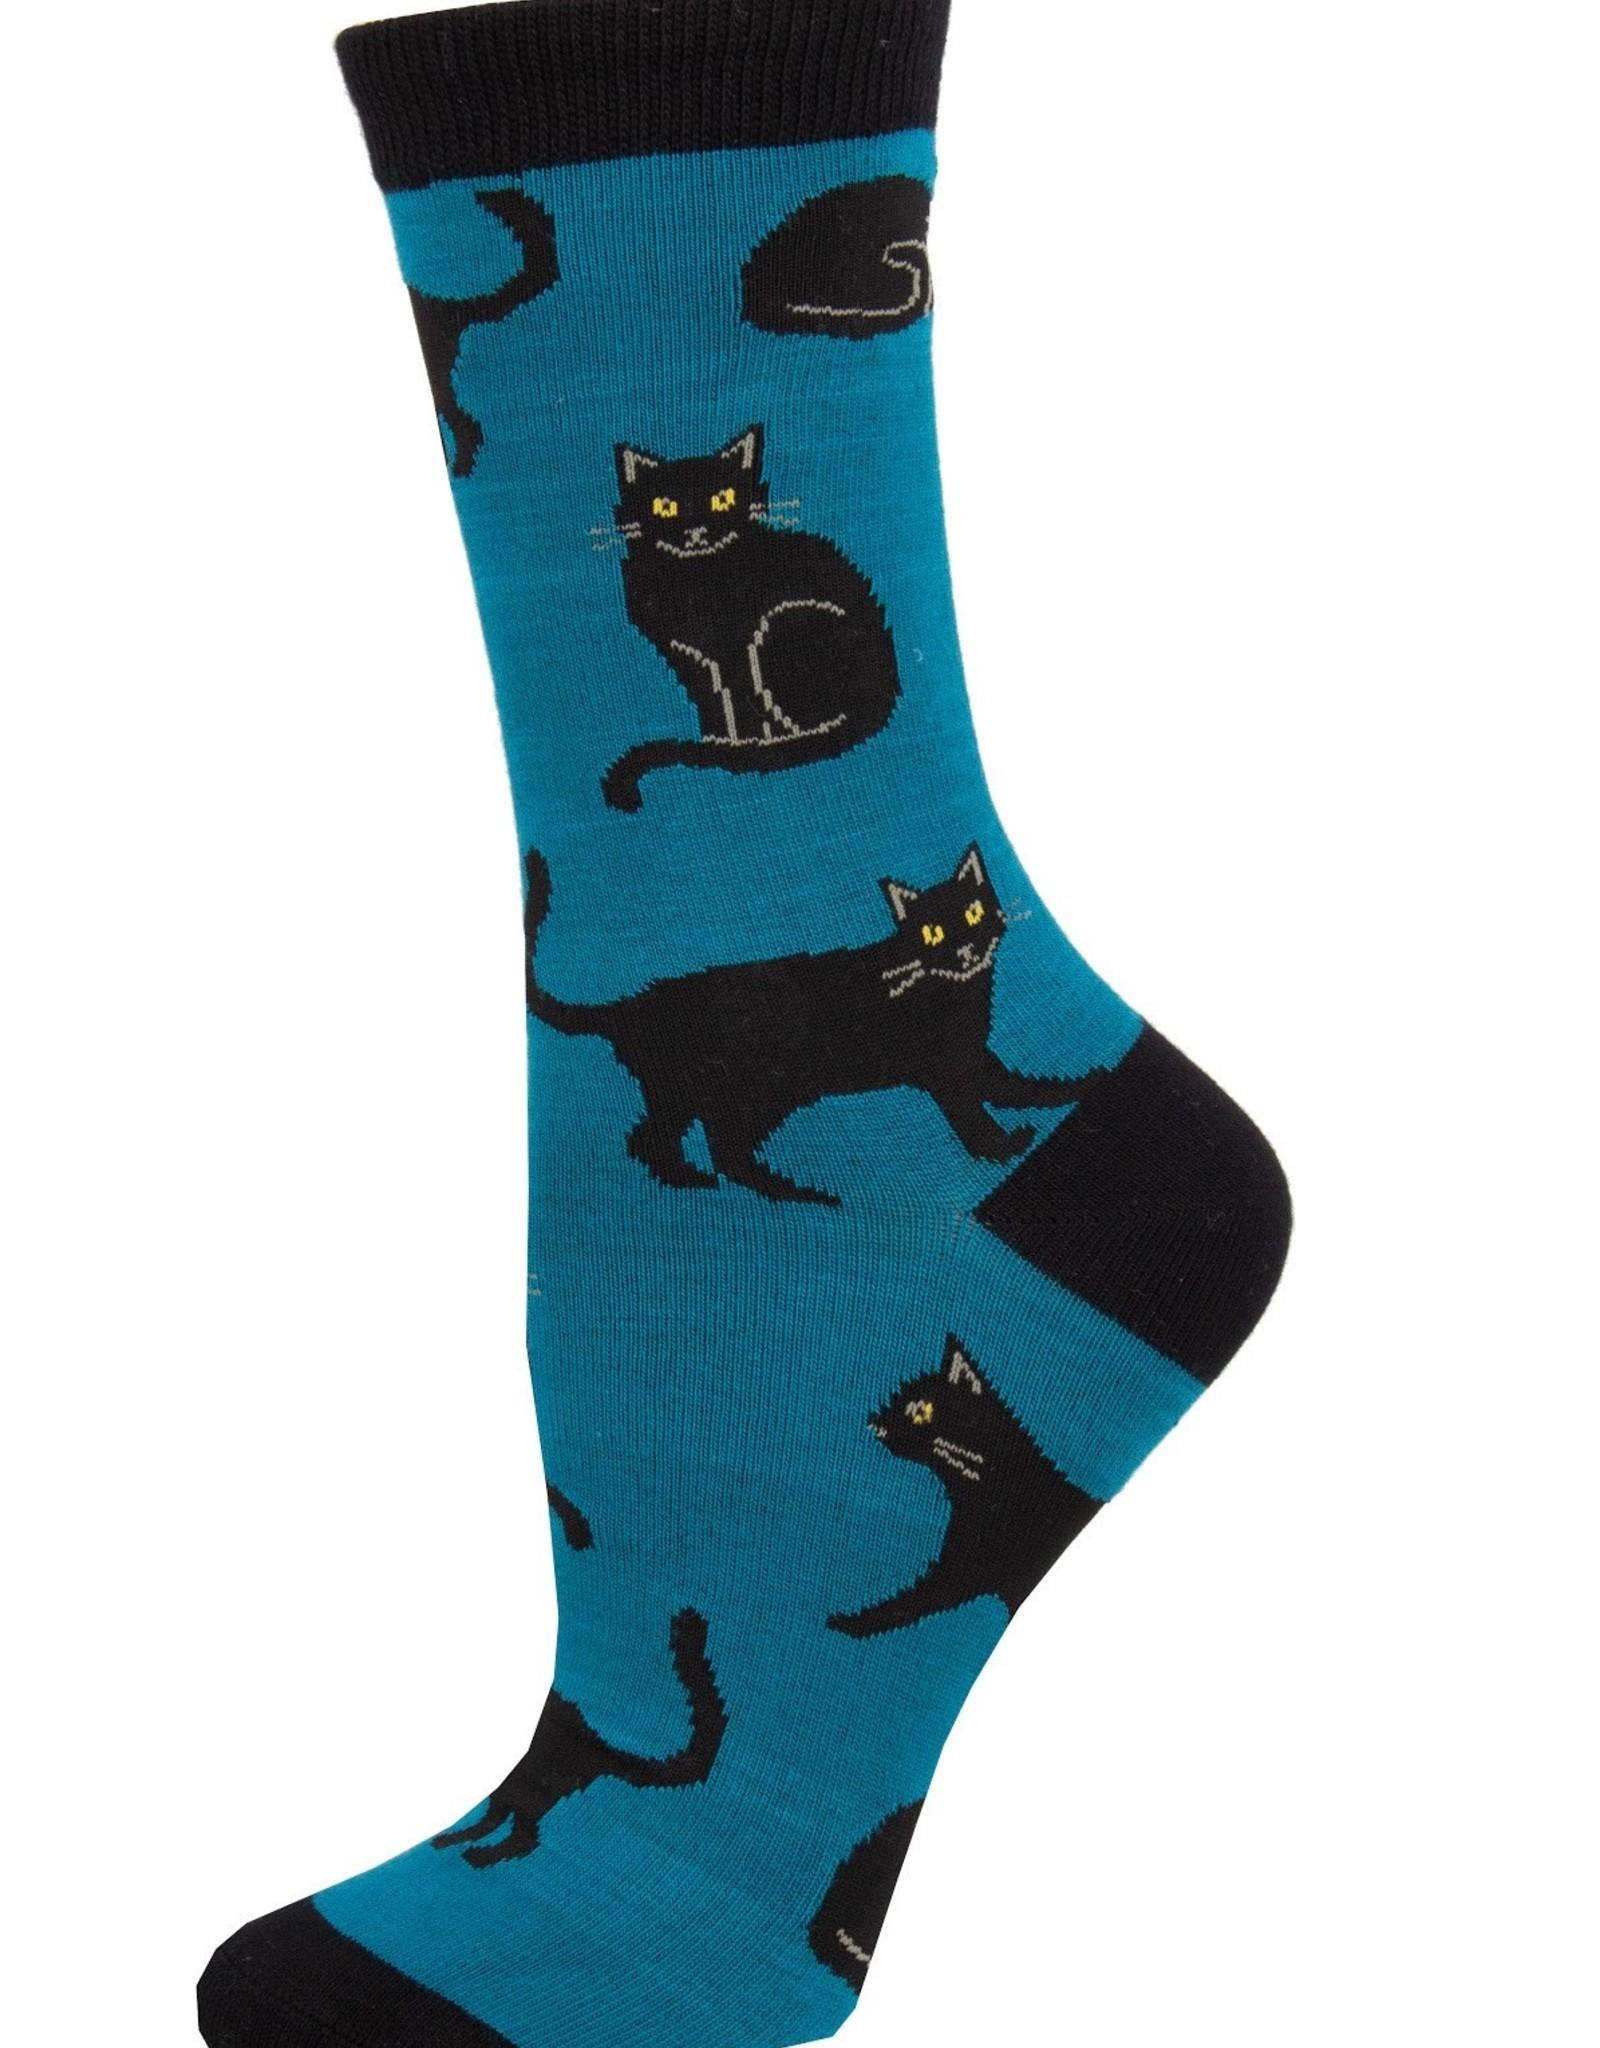 Black Cat blue socks